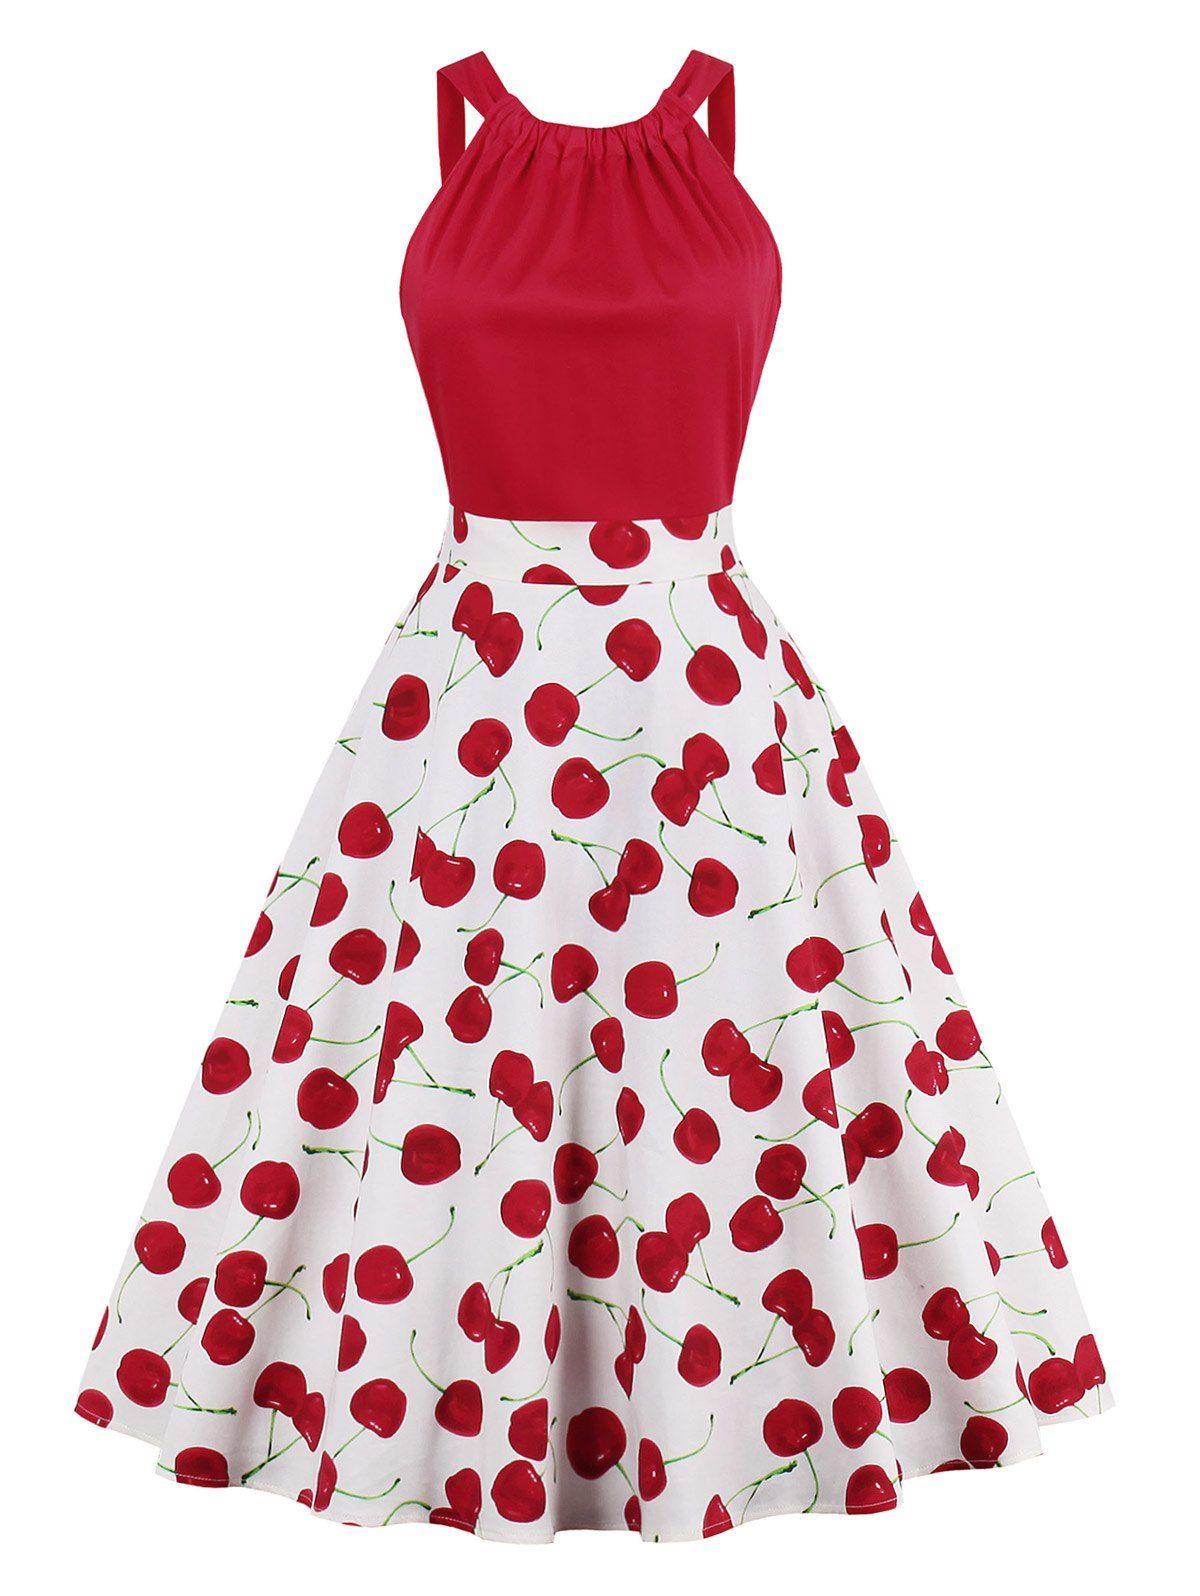 Pin de moontsukihime en dress | Pinterest | Roupas, Moda y Roupas ...